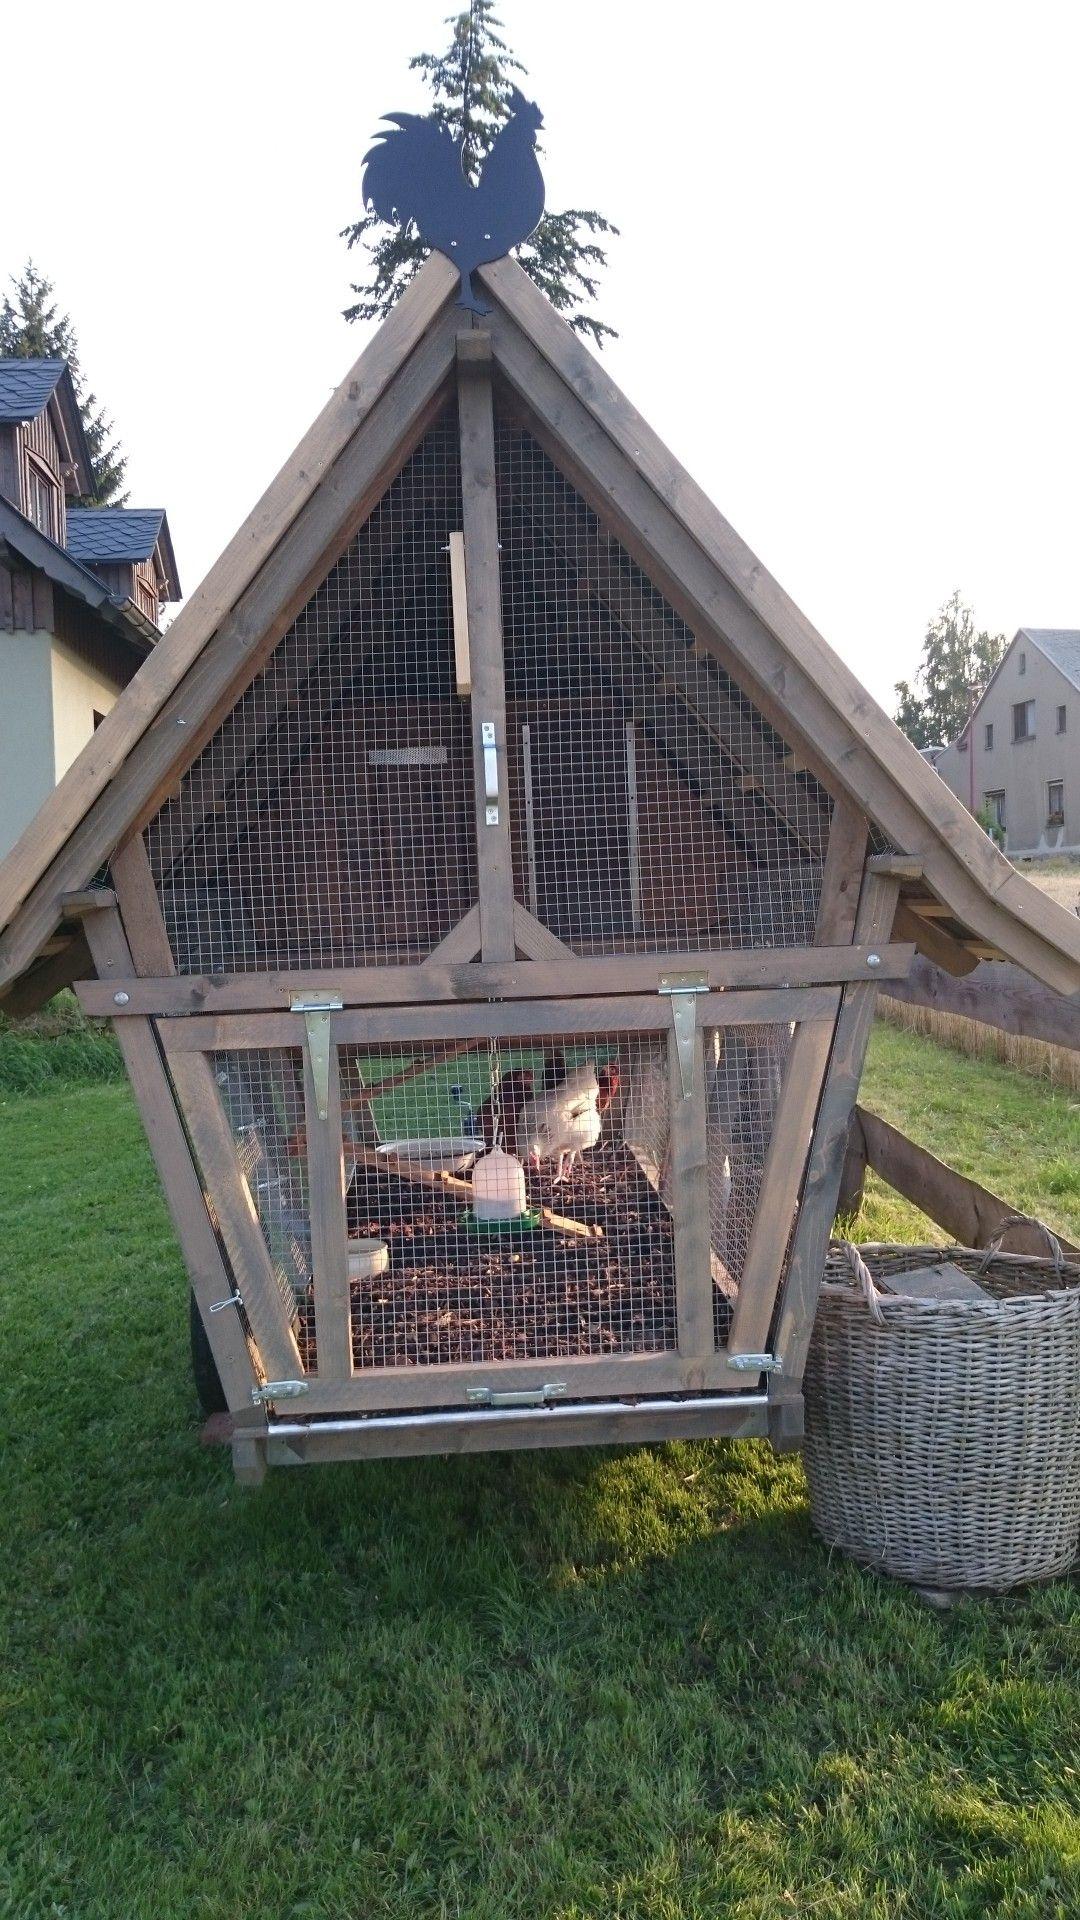 pin von matse 2140 auf mobiler hühnerstall | pinterest | mobiler